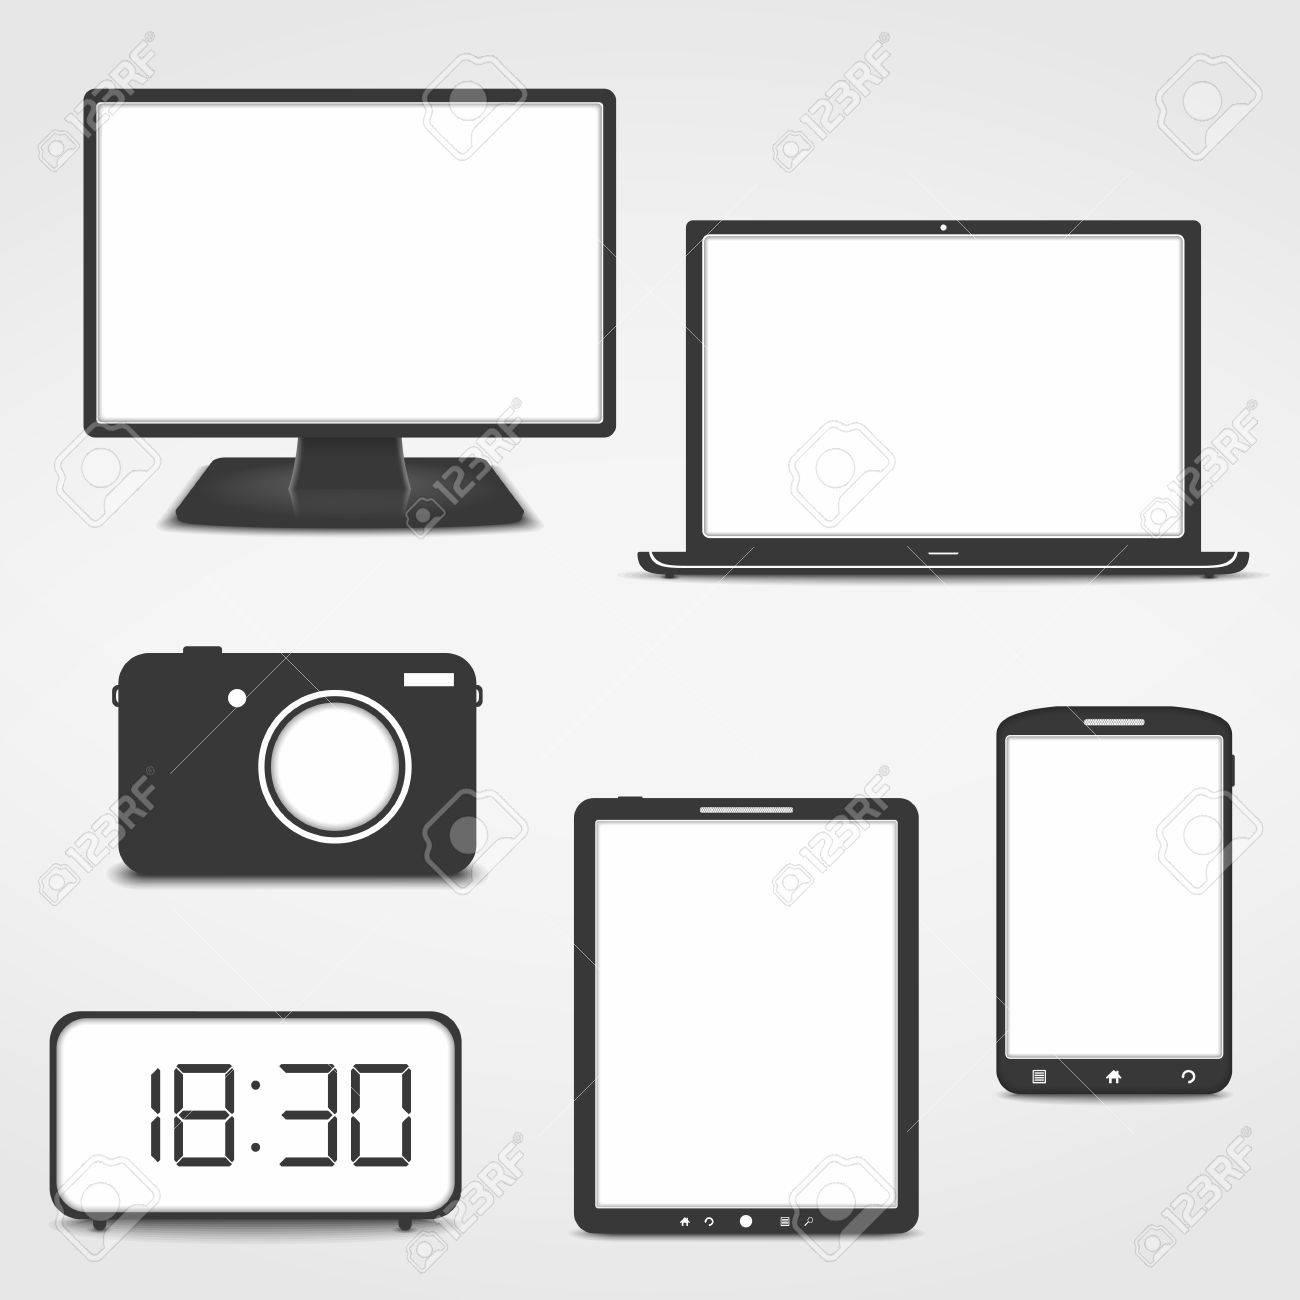 Electronics Icons Stock Vector - 22448666